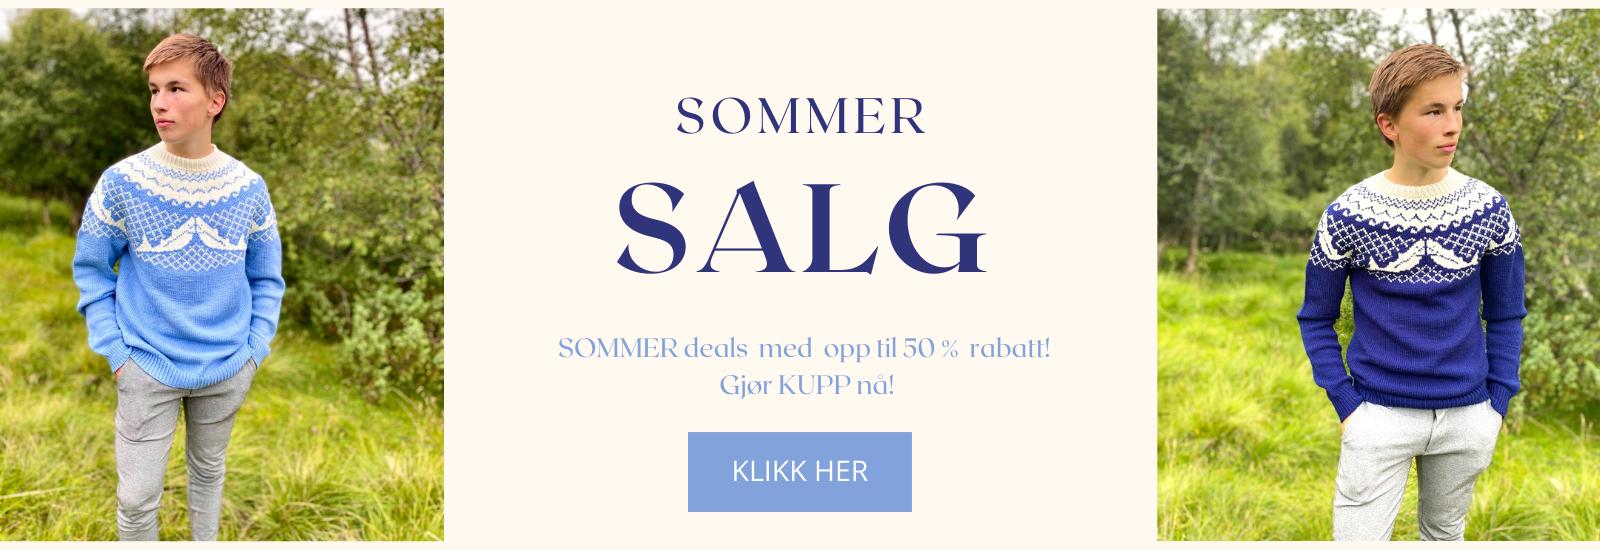 Norges beste garnbutikk garnsalg tilbud garnoutlet outlet salggarn garn